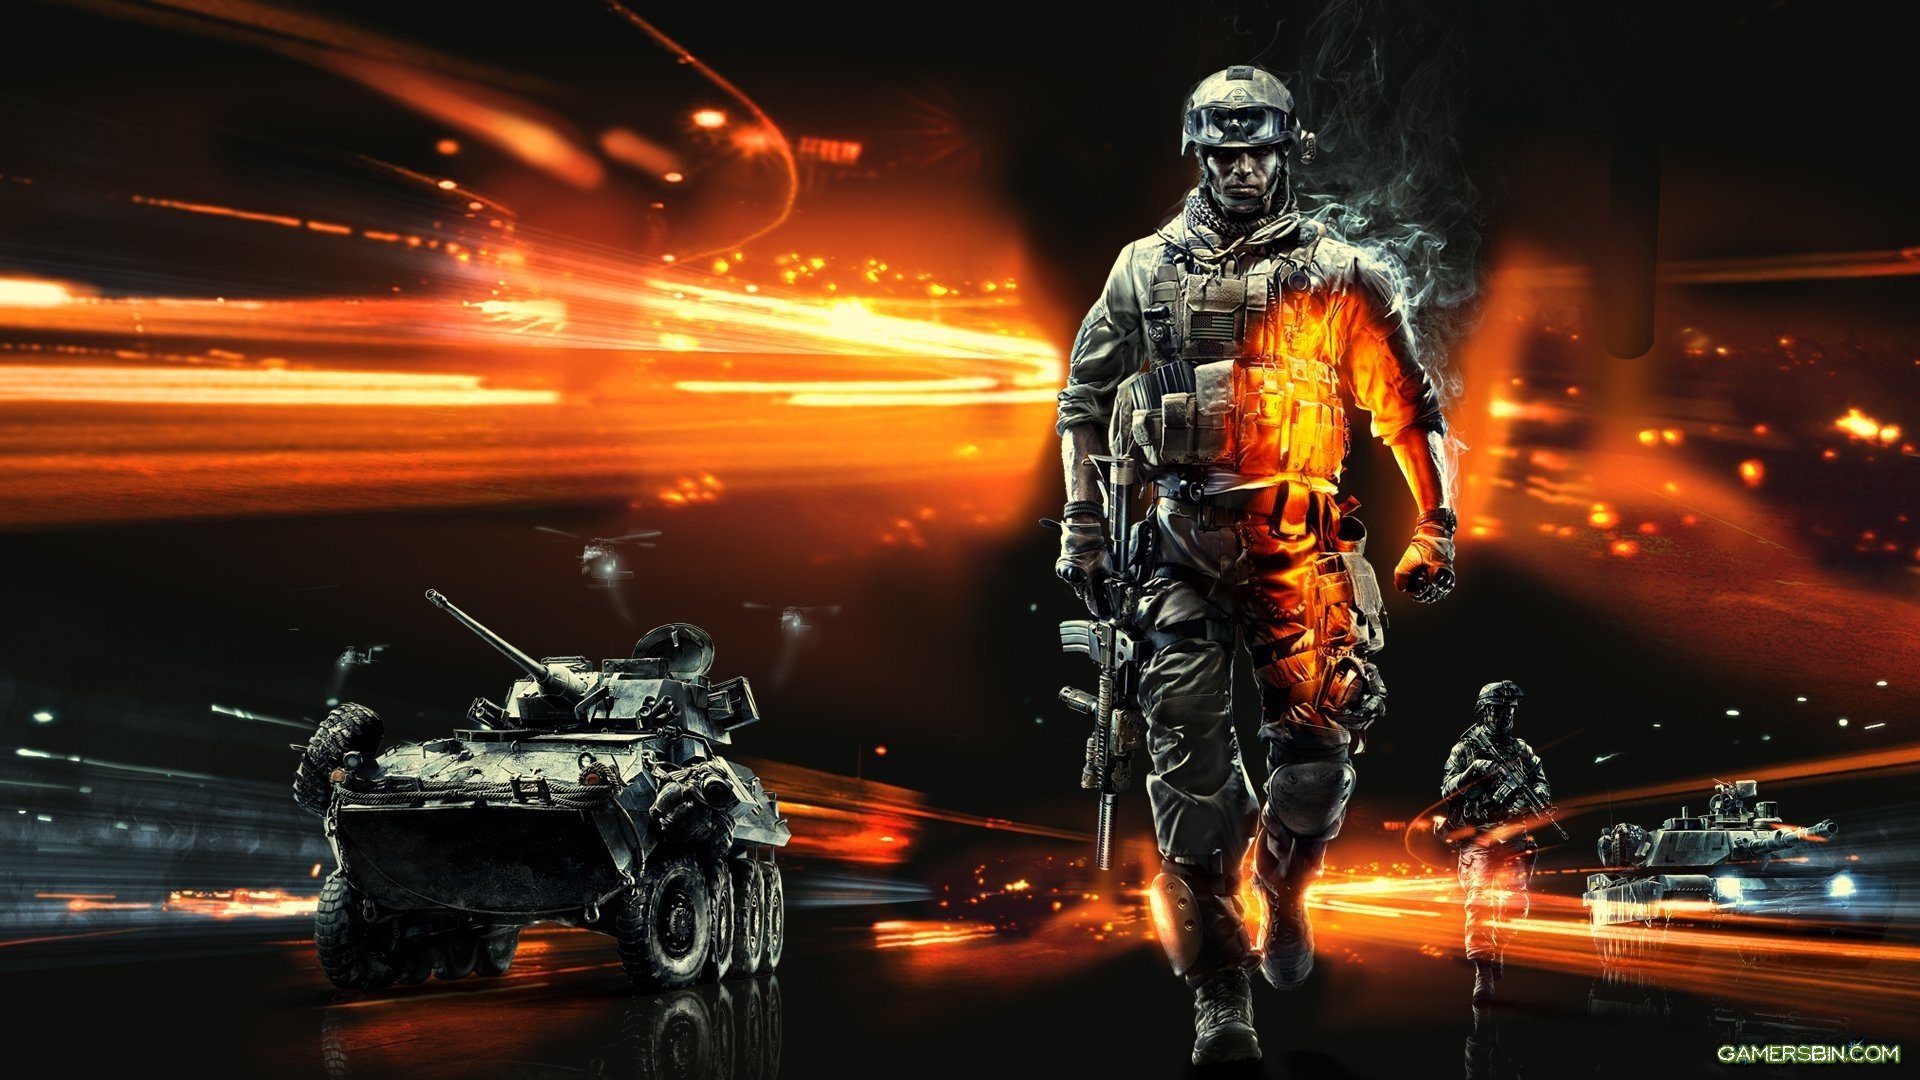 gamersbin com game wallpapers f137 hd battlefield 3 wallpapers 27190 1920x1080